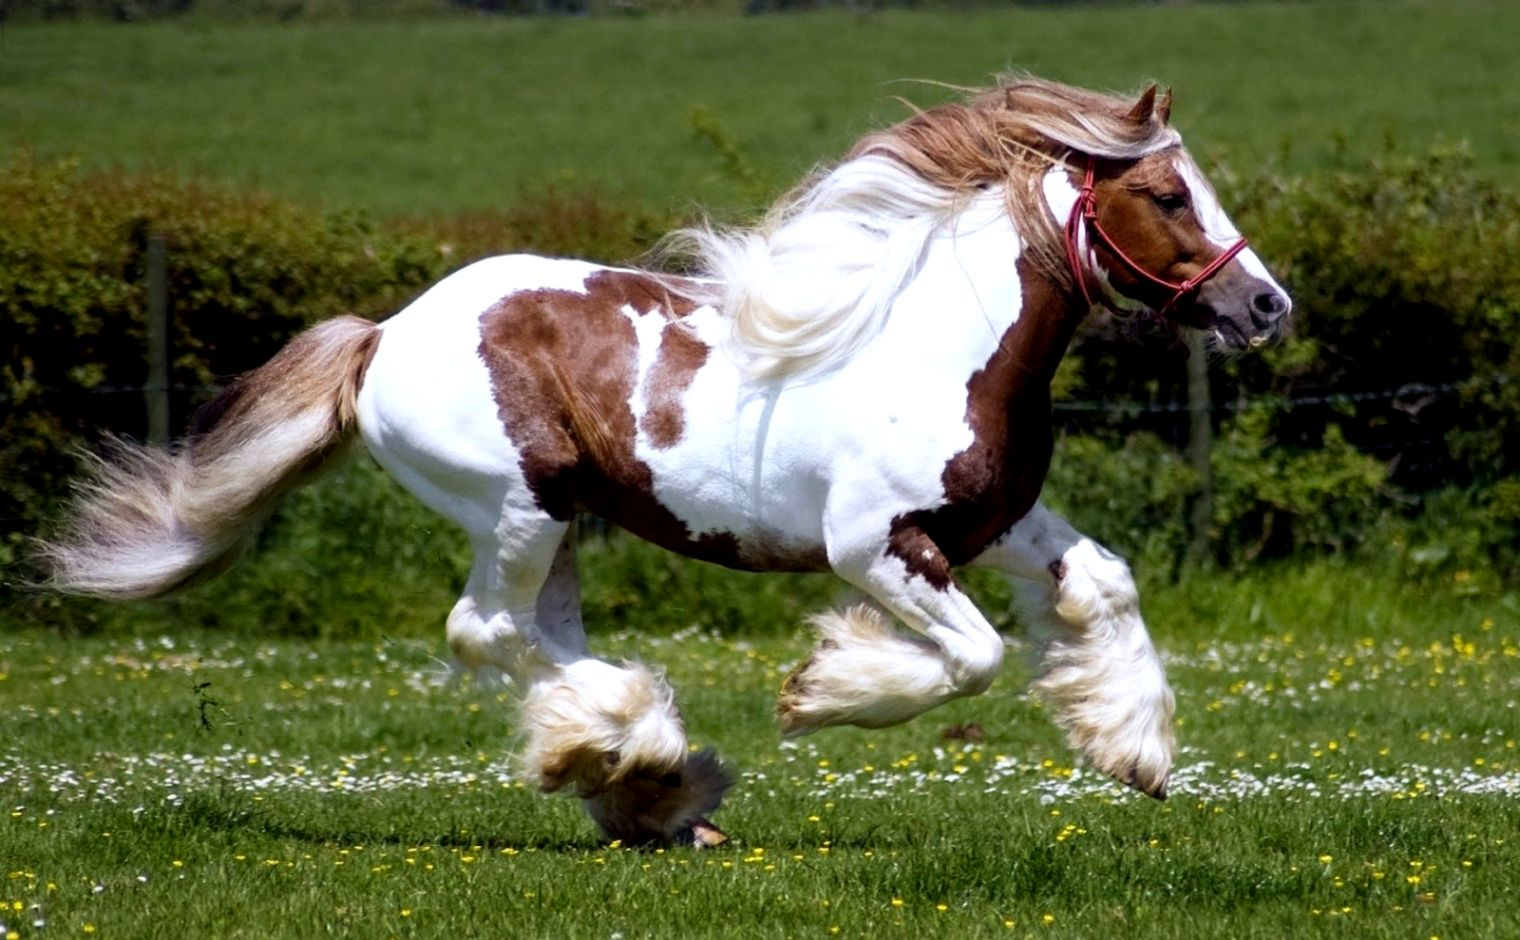 Horses Hd Wallpapers Elegant Wallpapers